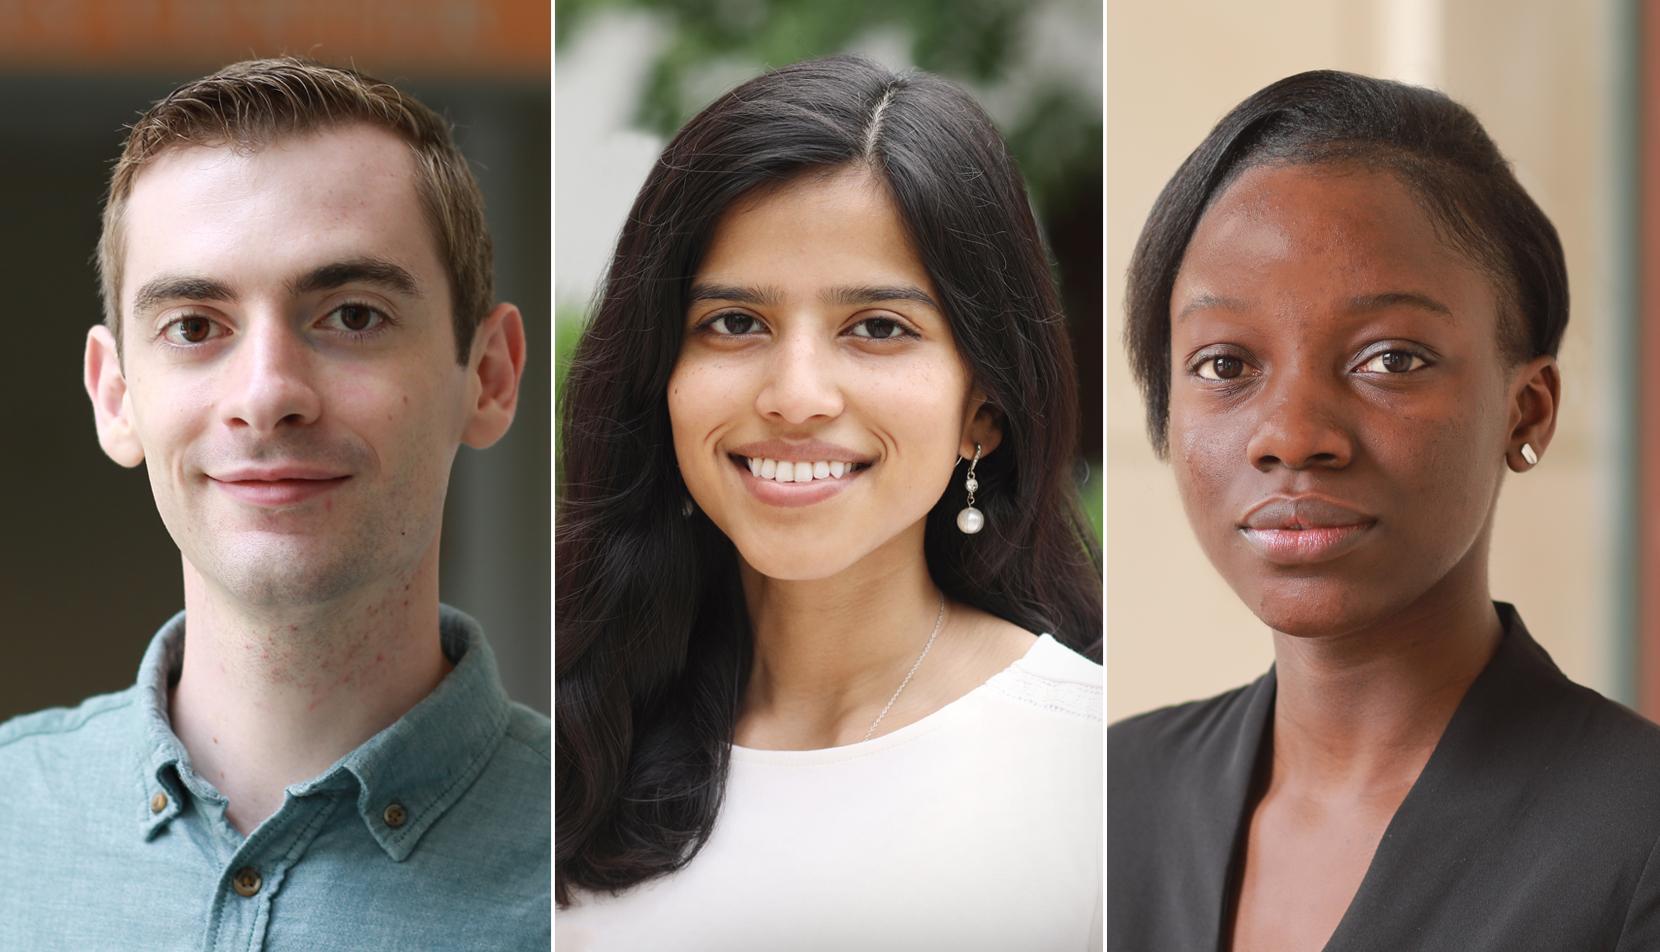 Kevin Jackson, Shweta Kumar and Doriane Steva Nguenang Tchenga